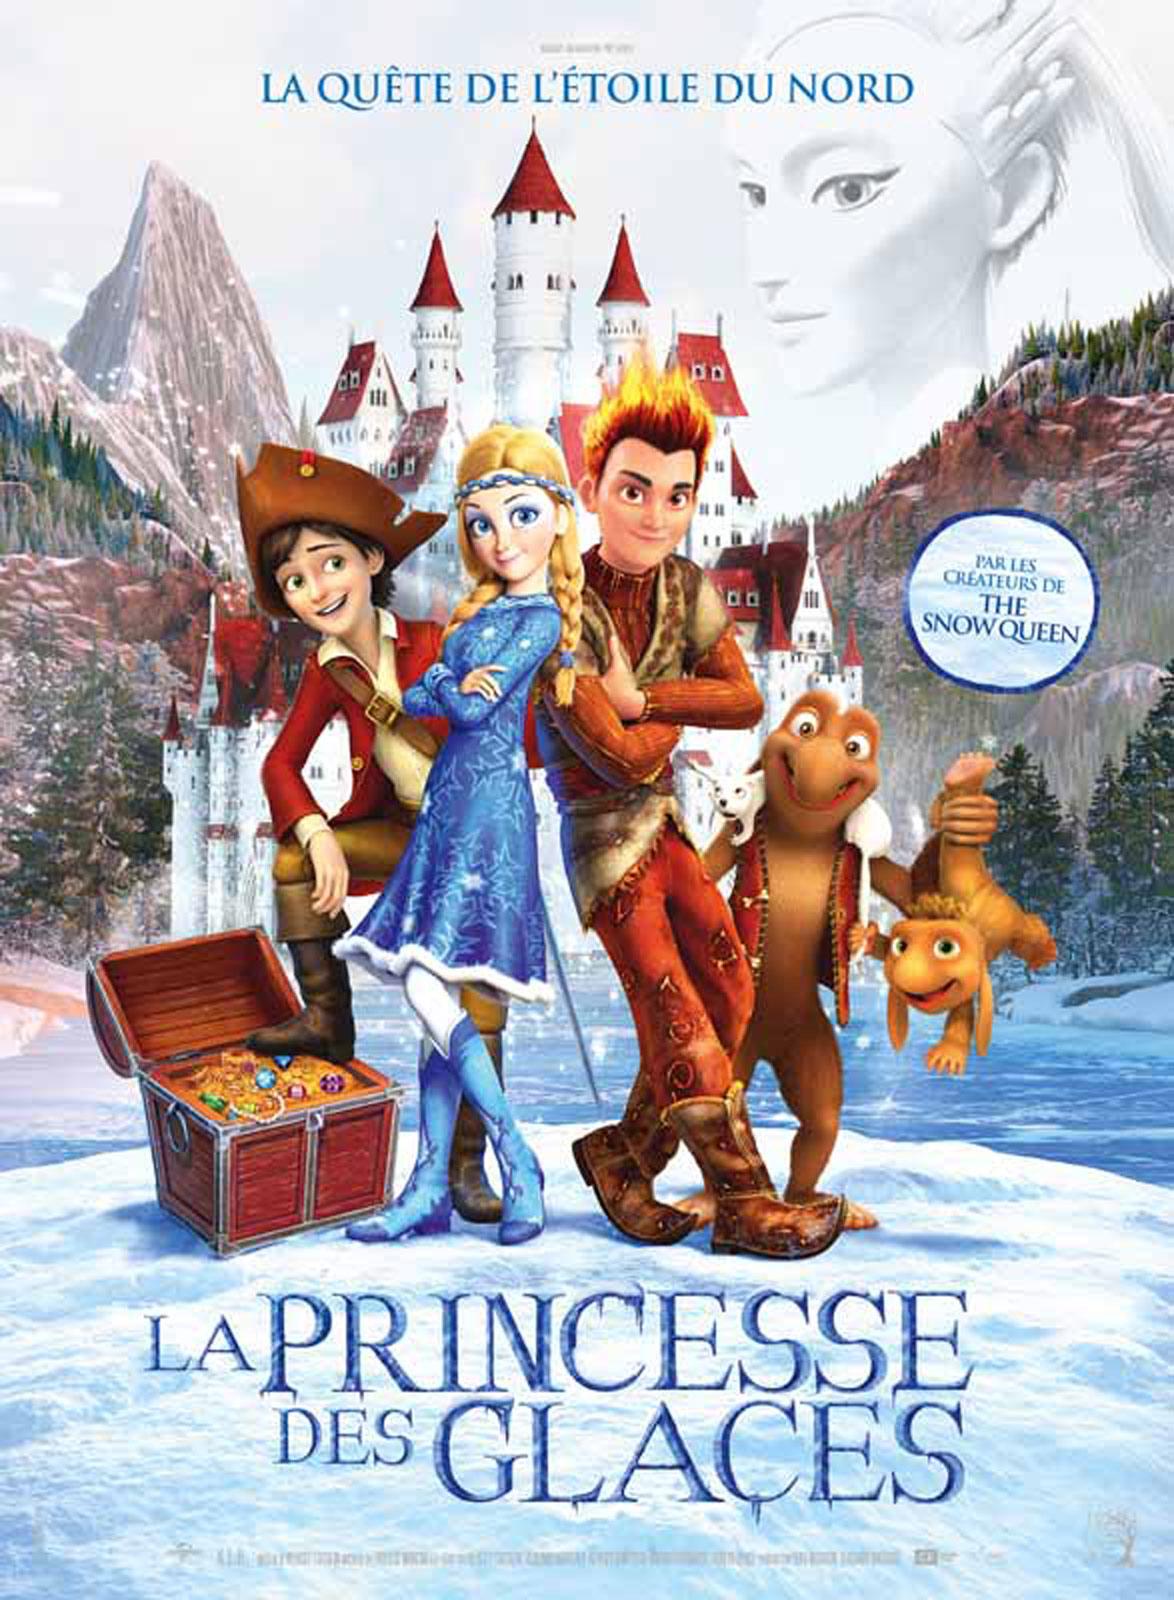 La princesse des glaces dvd blu ray - La reine des glace streaming ...